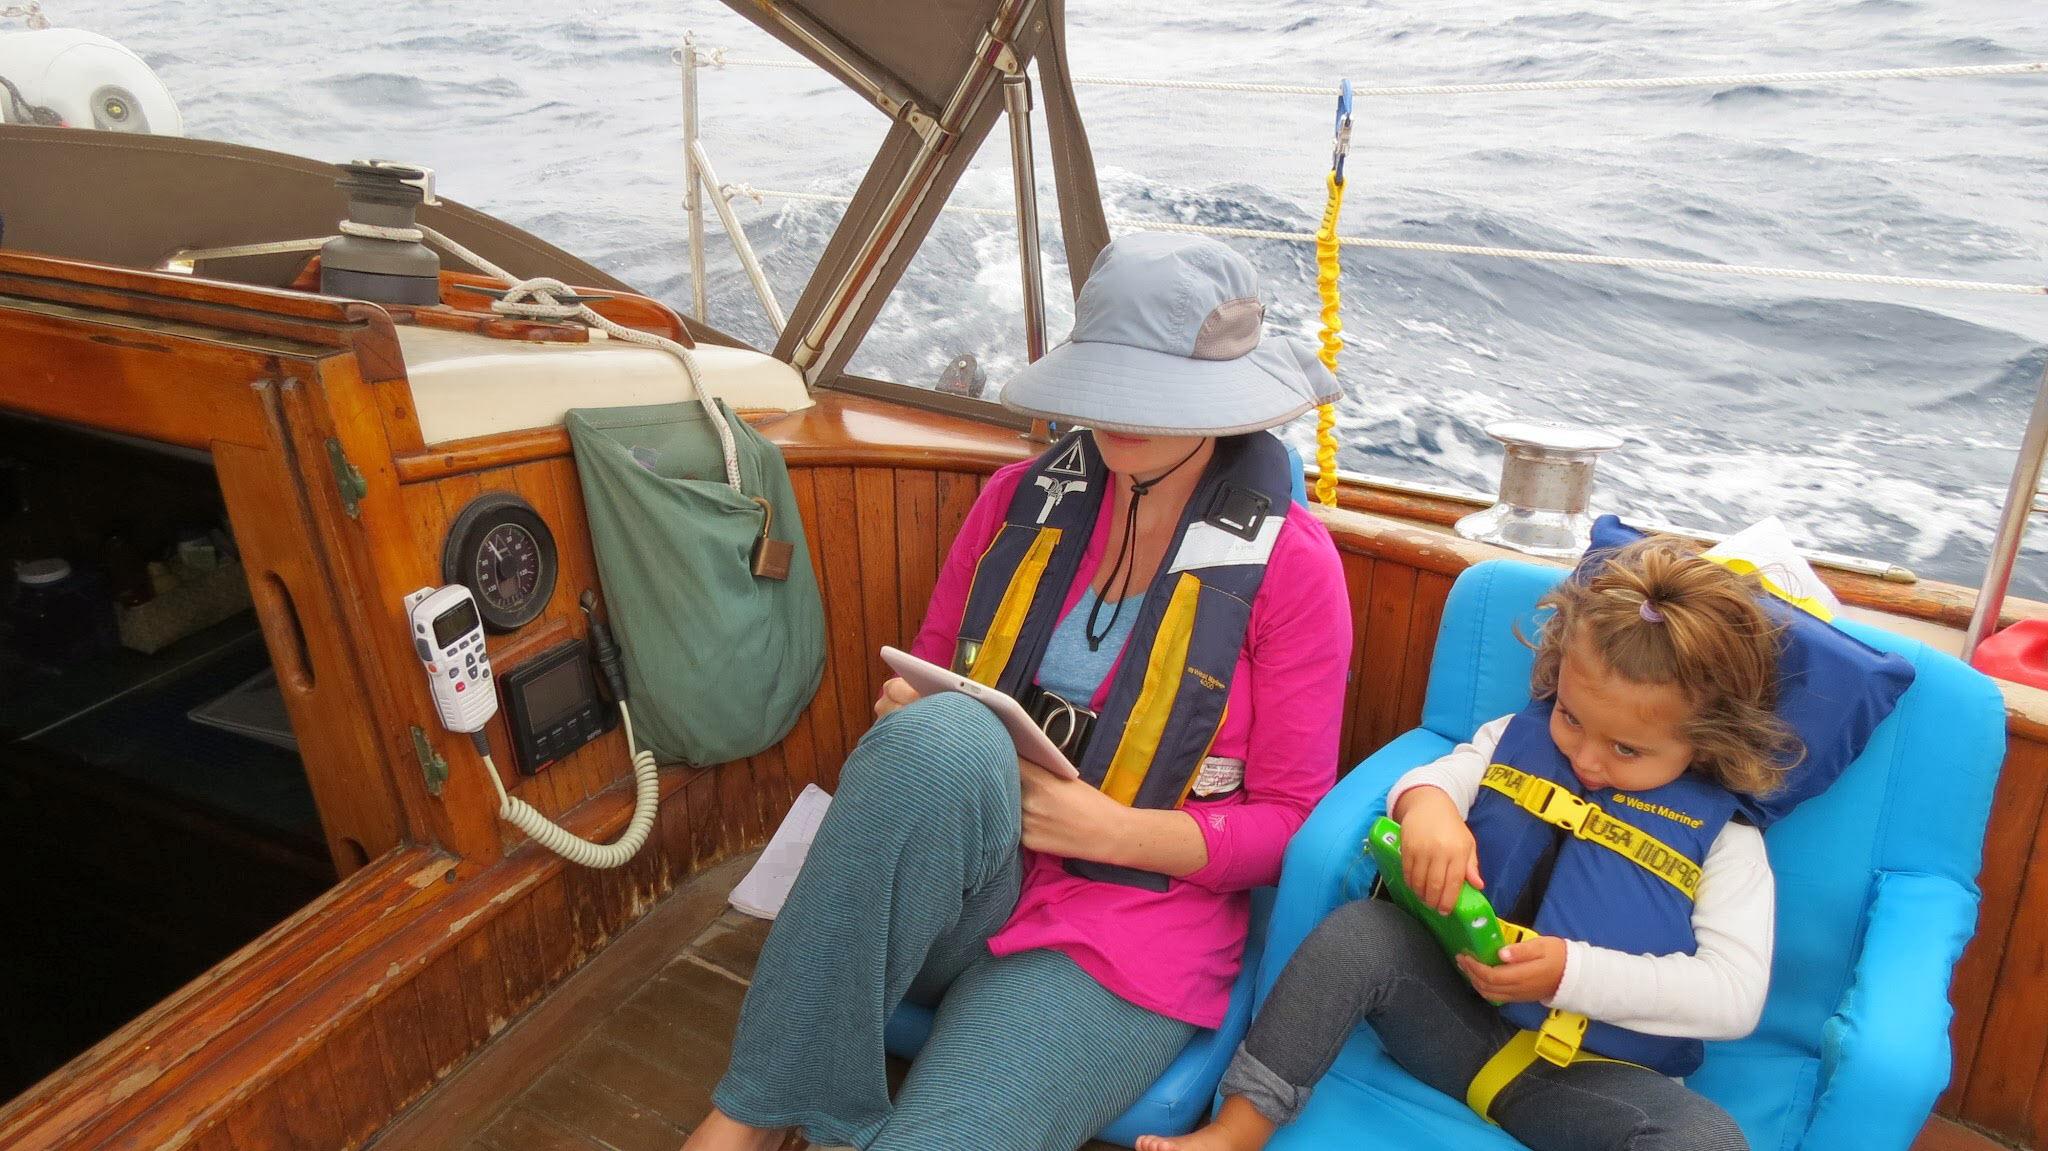 Charlotte and Cora Kaufman. Sailing across the Sea of Cortez from La Paz to La Cruz de Huanacaxtle, Nayarit. December 2013.